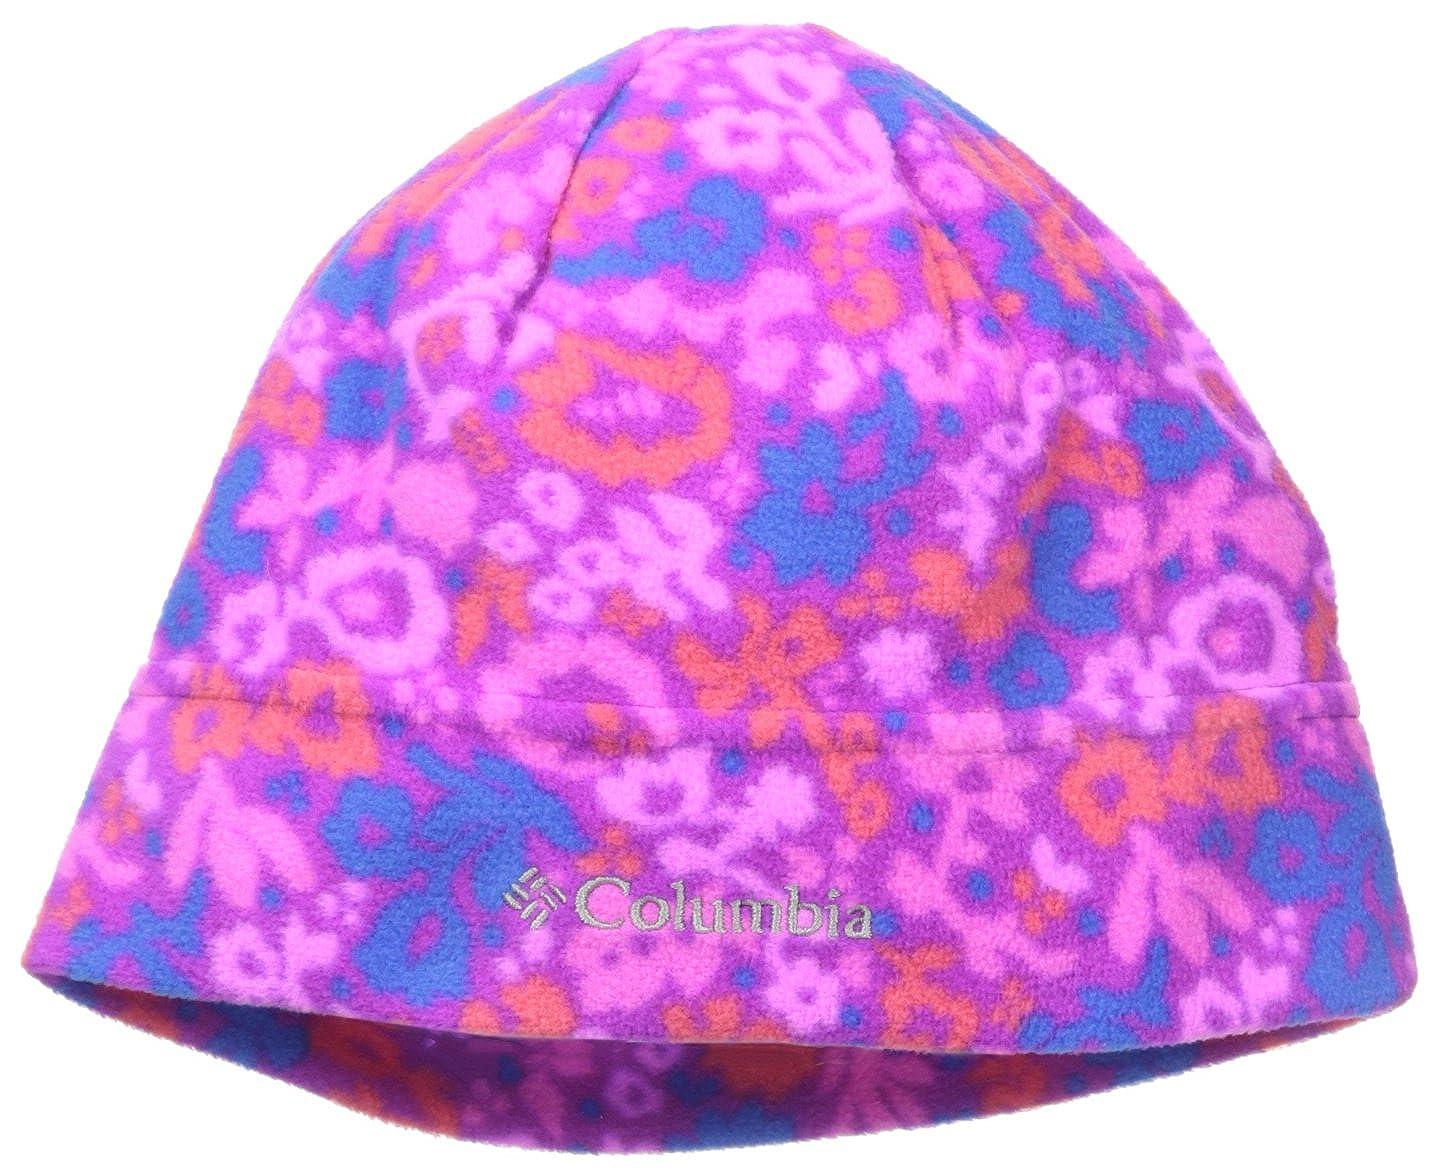 7ebf785faf8f2 Amazon.com  Columbia Big Girls  Youth Glacial Fleece Hat  Clothing